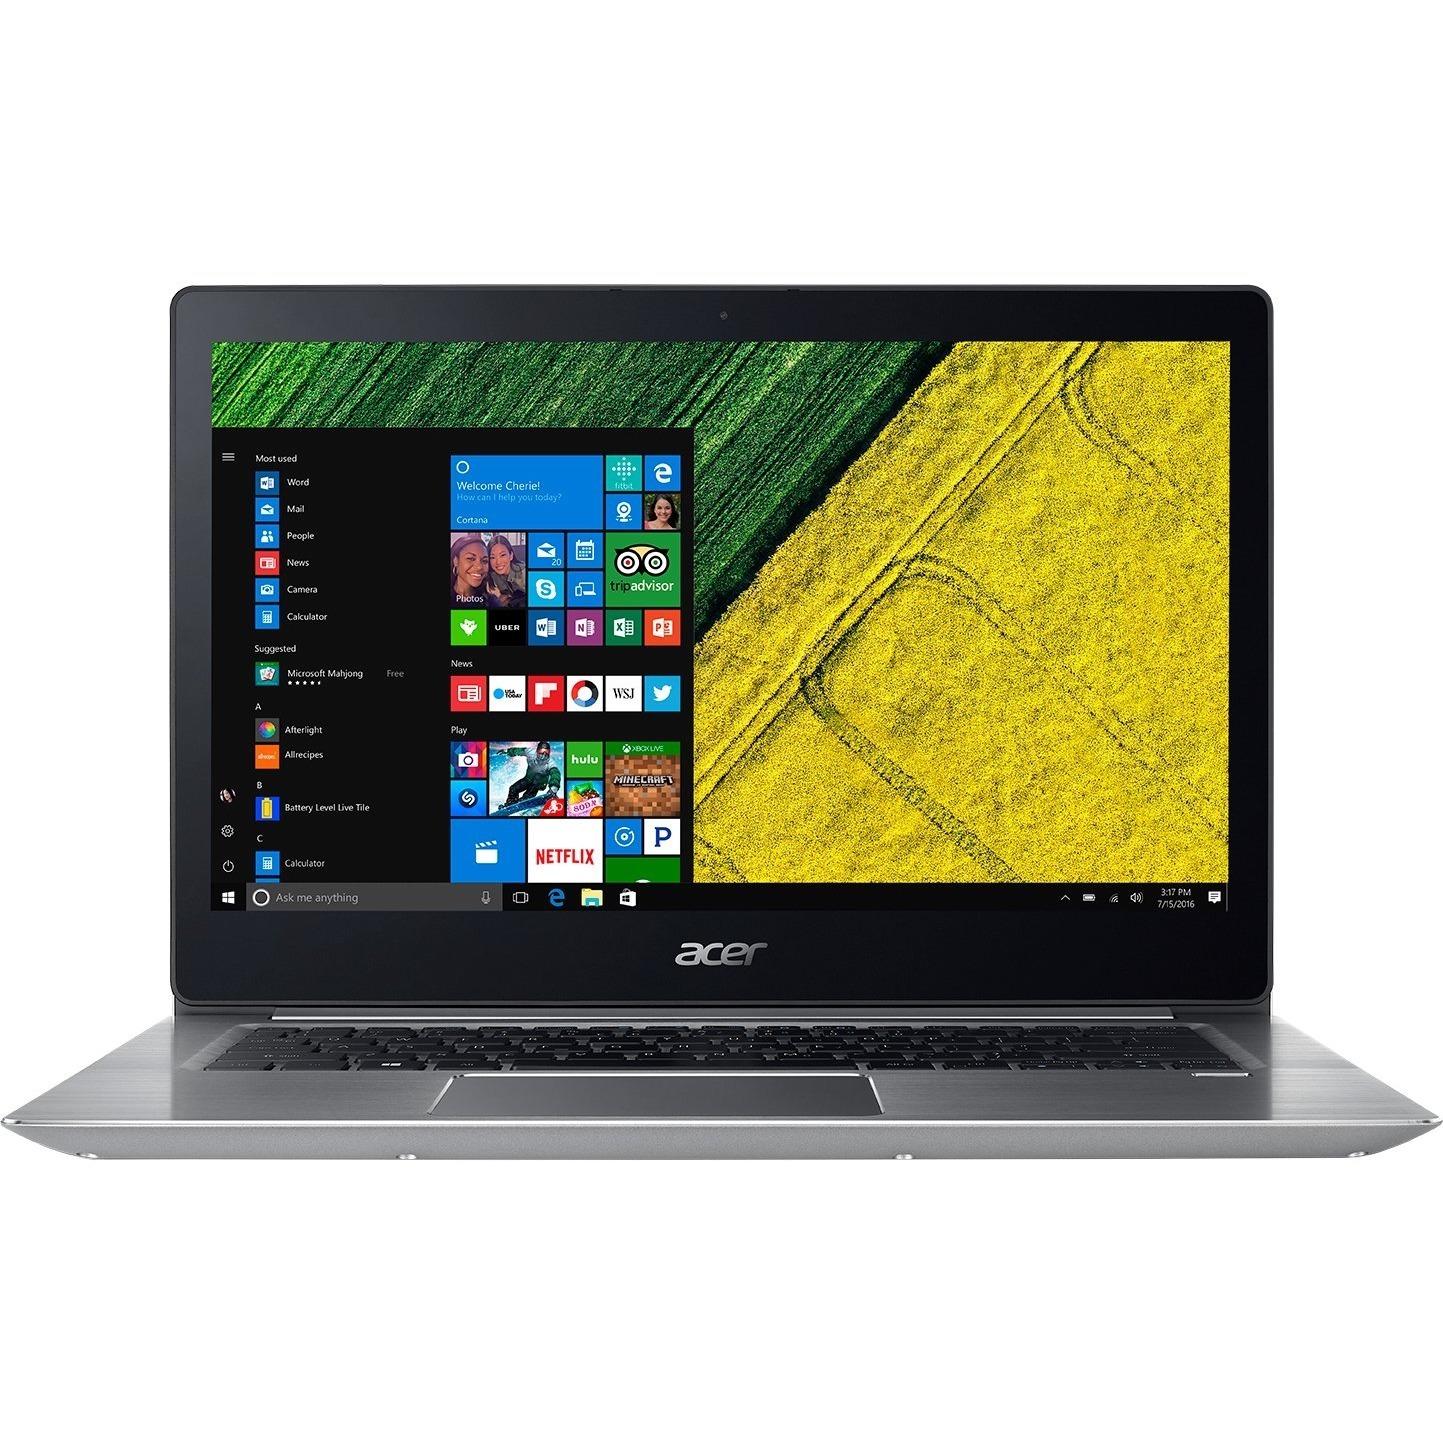 "Acer Swift 3 SF314-52 SF314-52-517Z 14"" Core i5-8250U 8GB DDR4 256GB SSD - Windows 10 Home 1920 x 1080 IPS sparkly Silver Ultrabook"